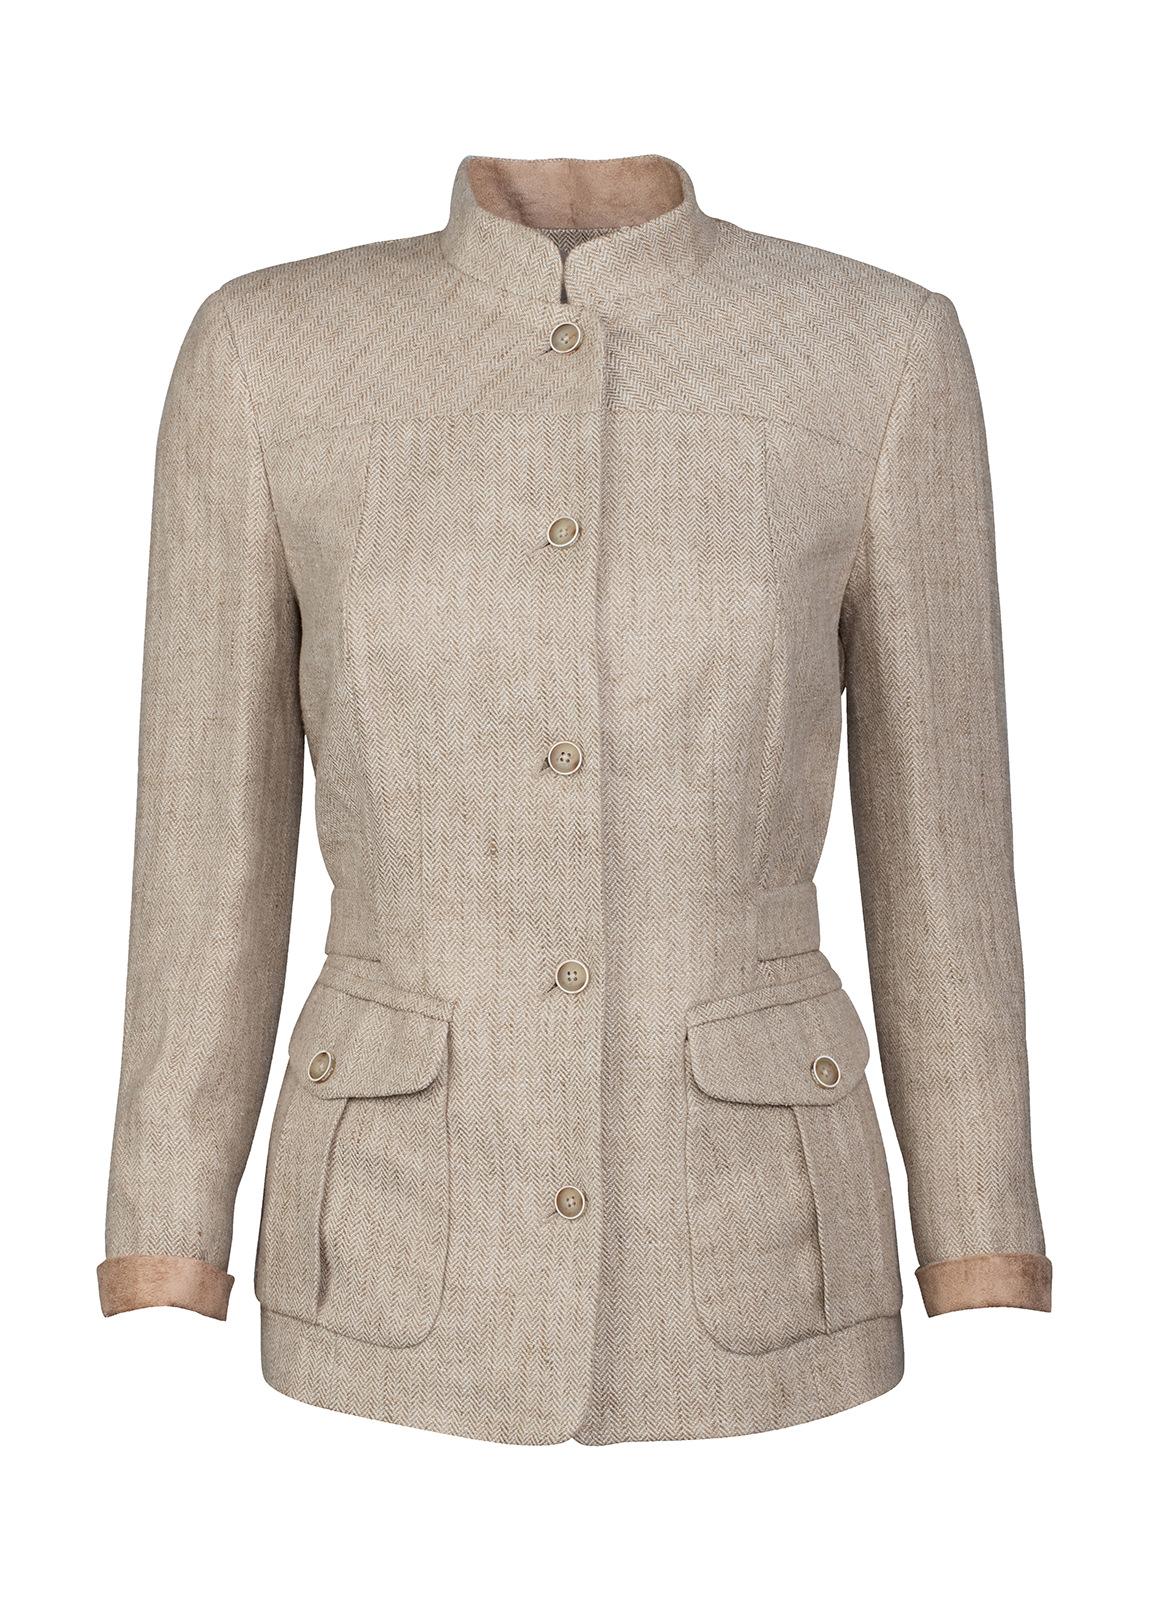 Dubarry_ Malahide Women's Linen Jacket - Oatmeal_Image_2